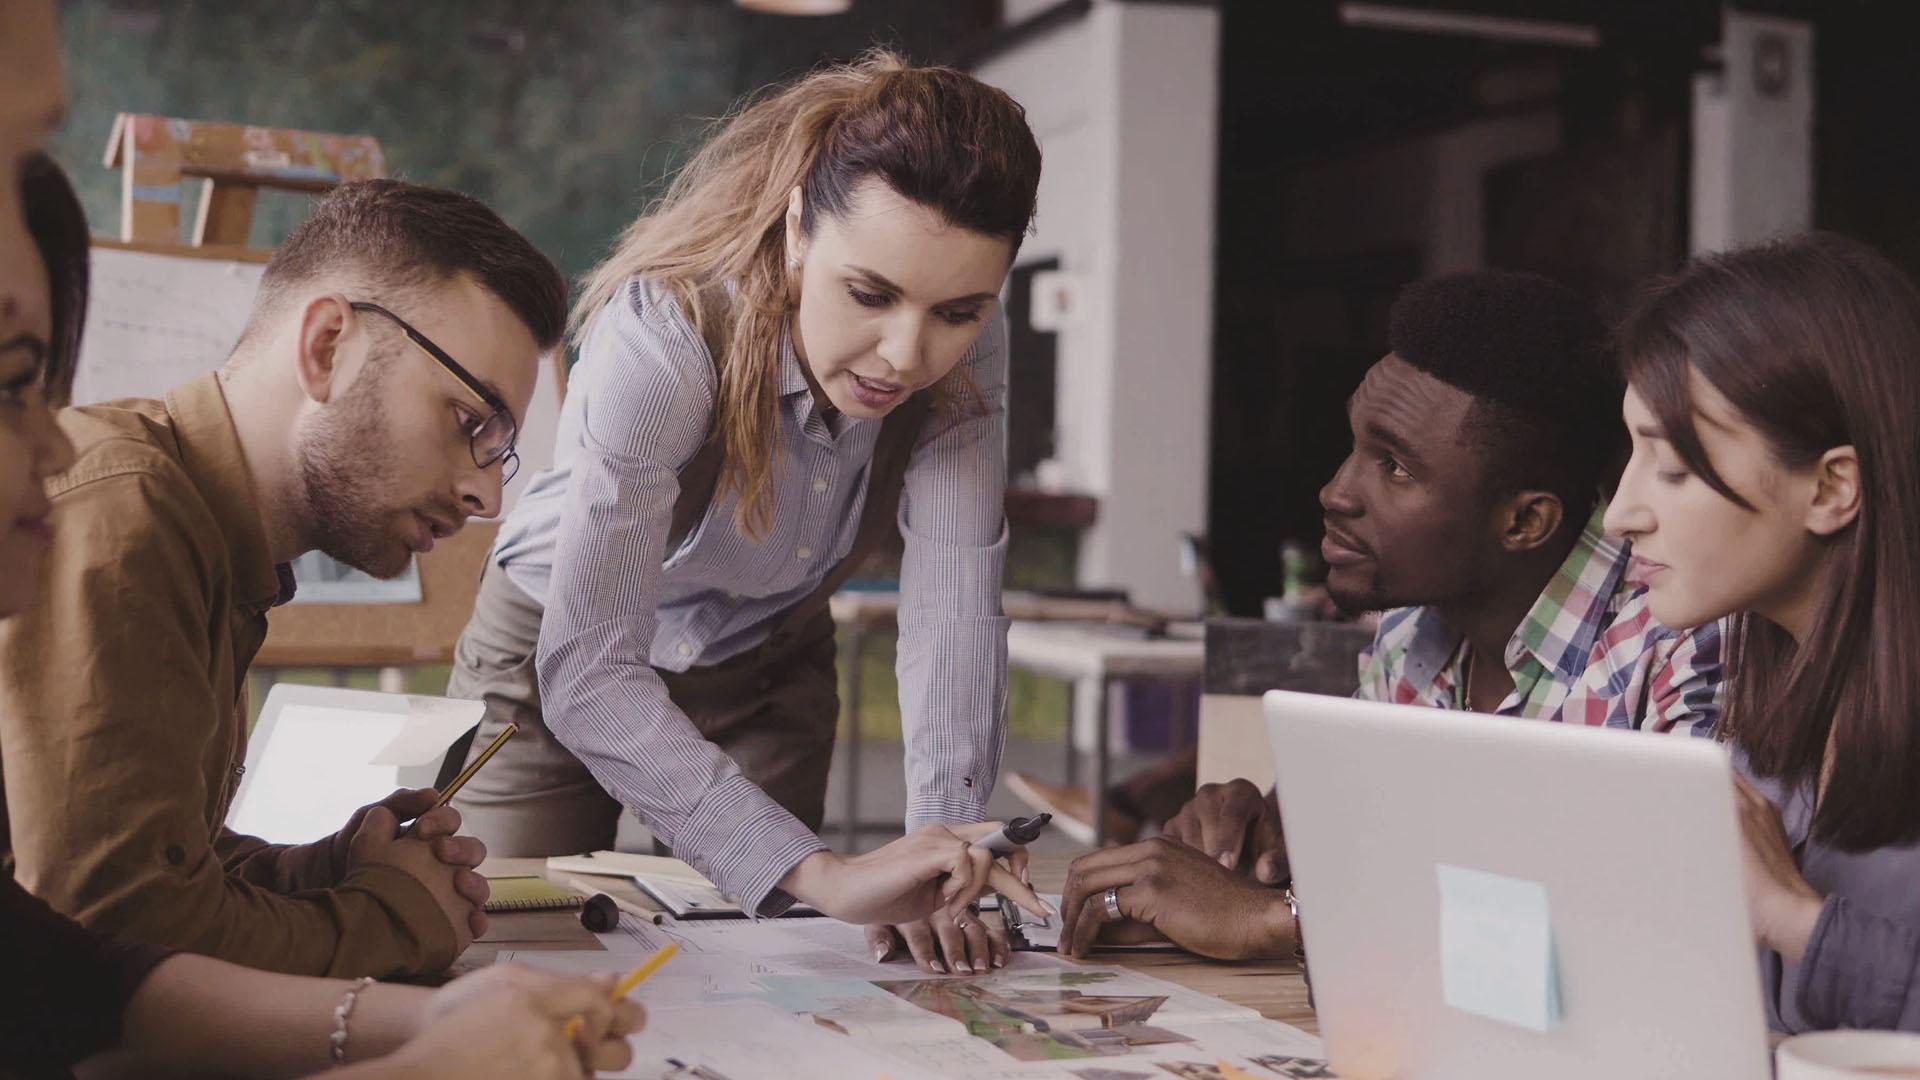 20 perguntas e respostas para entrevistas de emprego